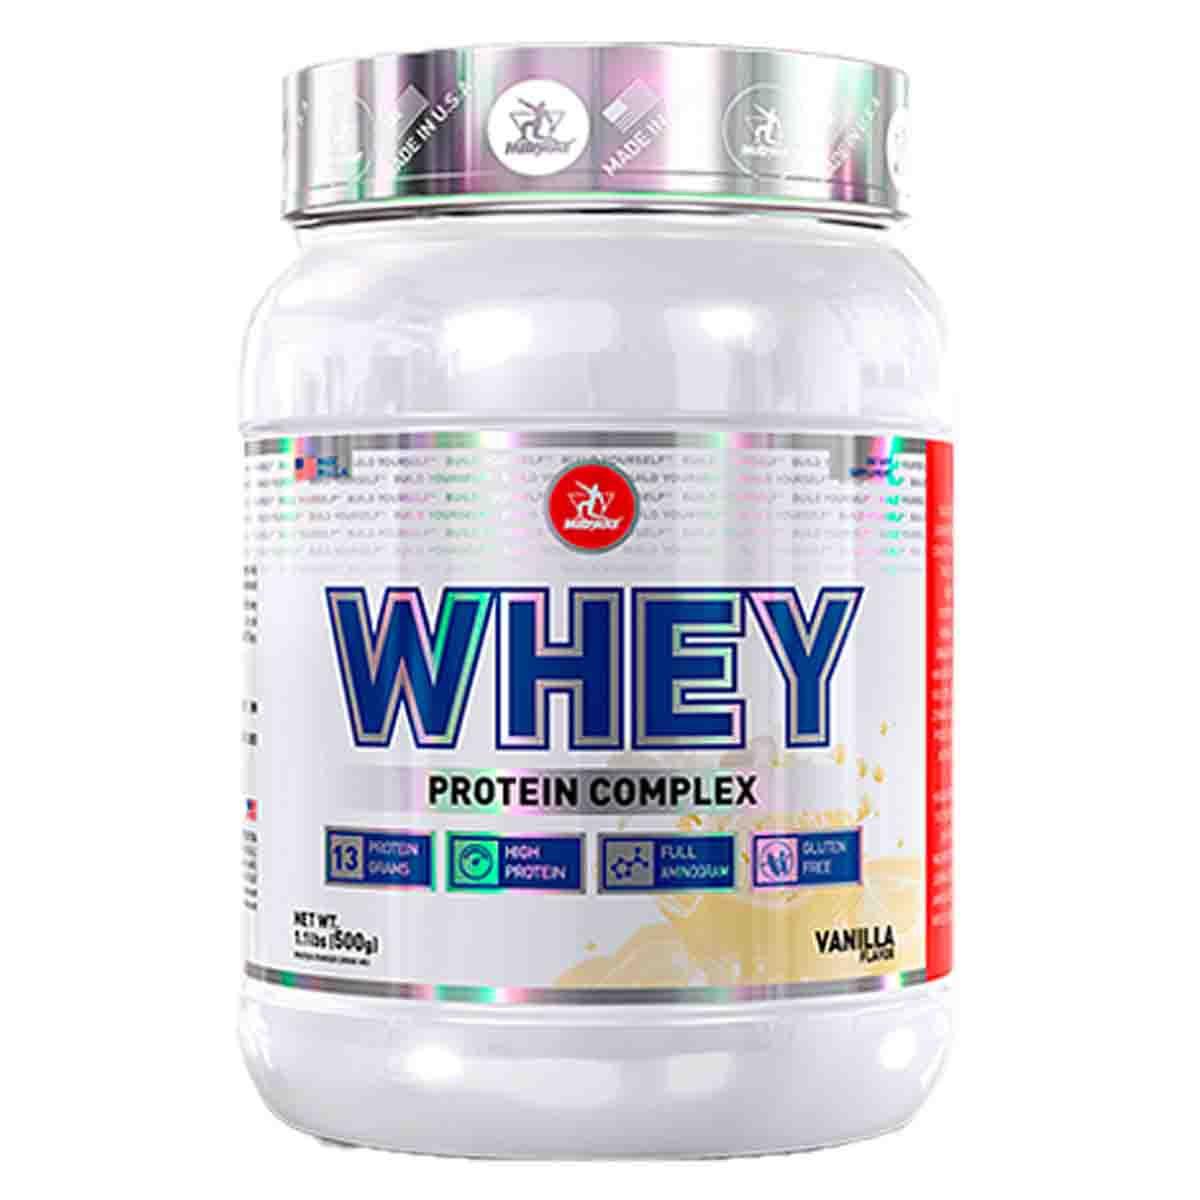 Whey Protein Complex 500g - Midway